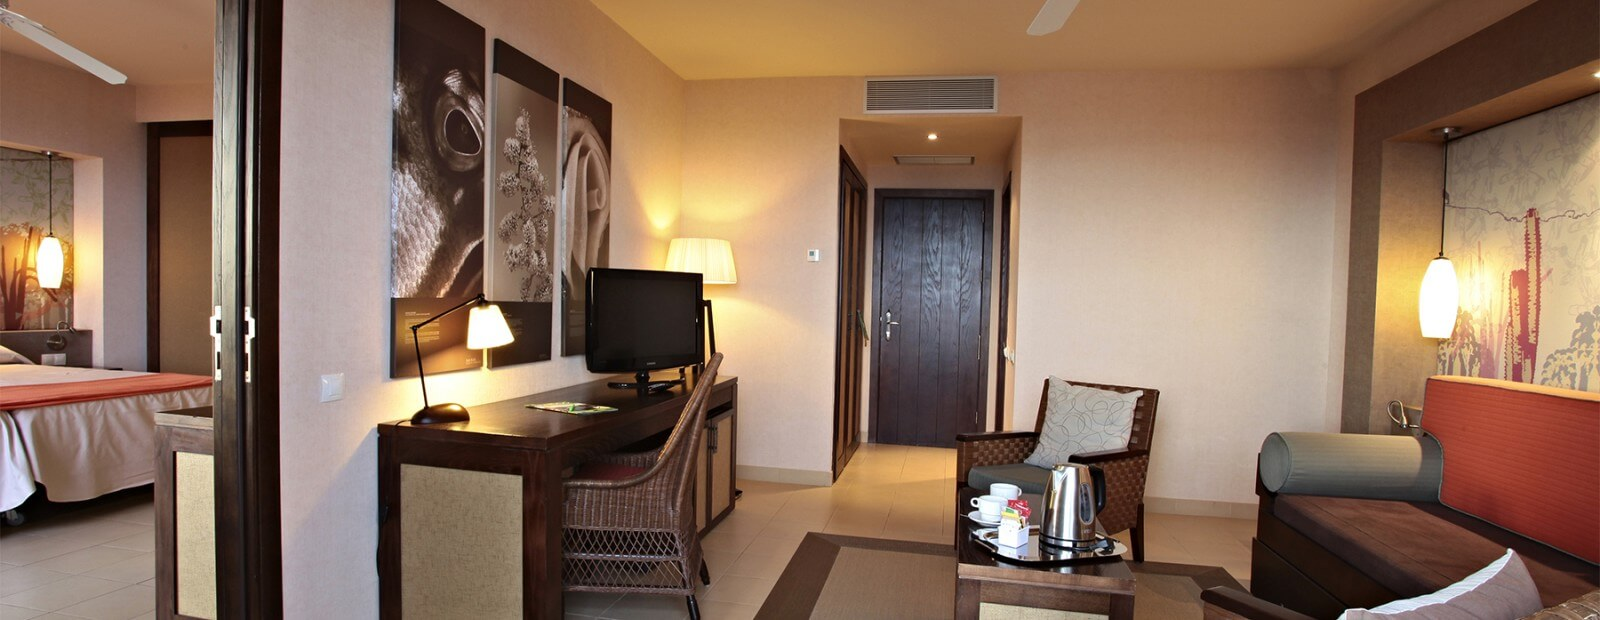 Sandos San Blas Suite